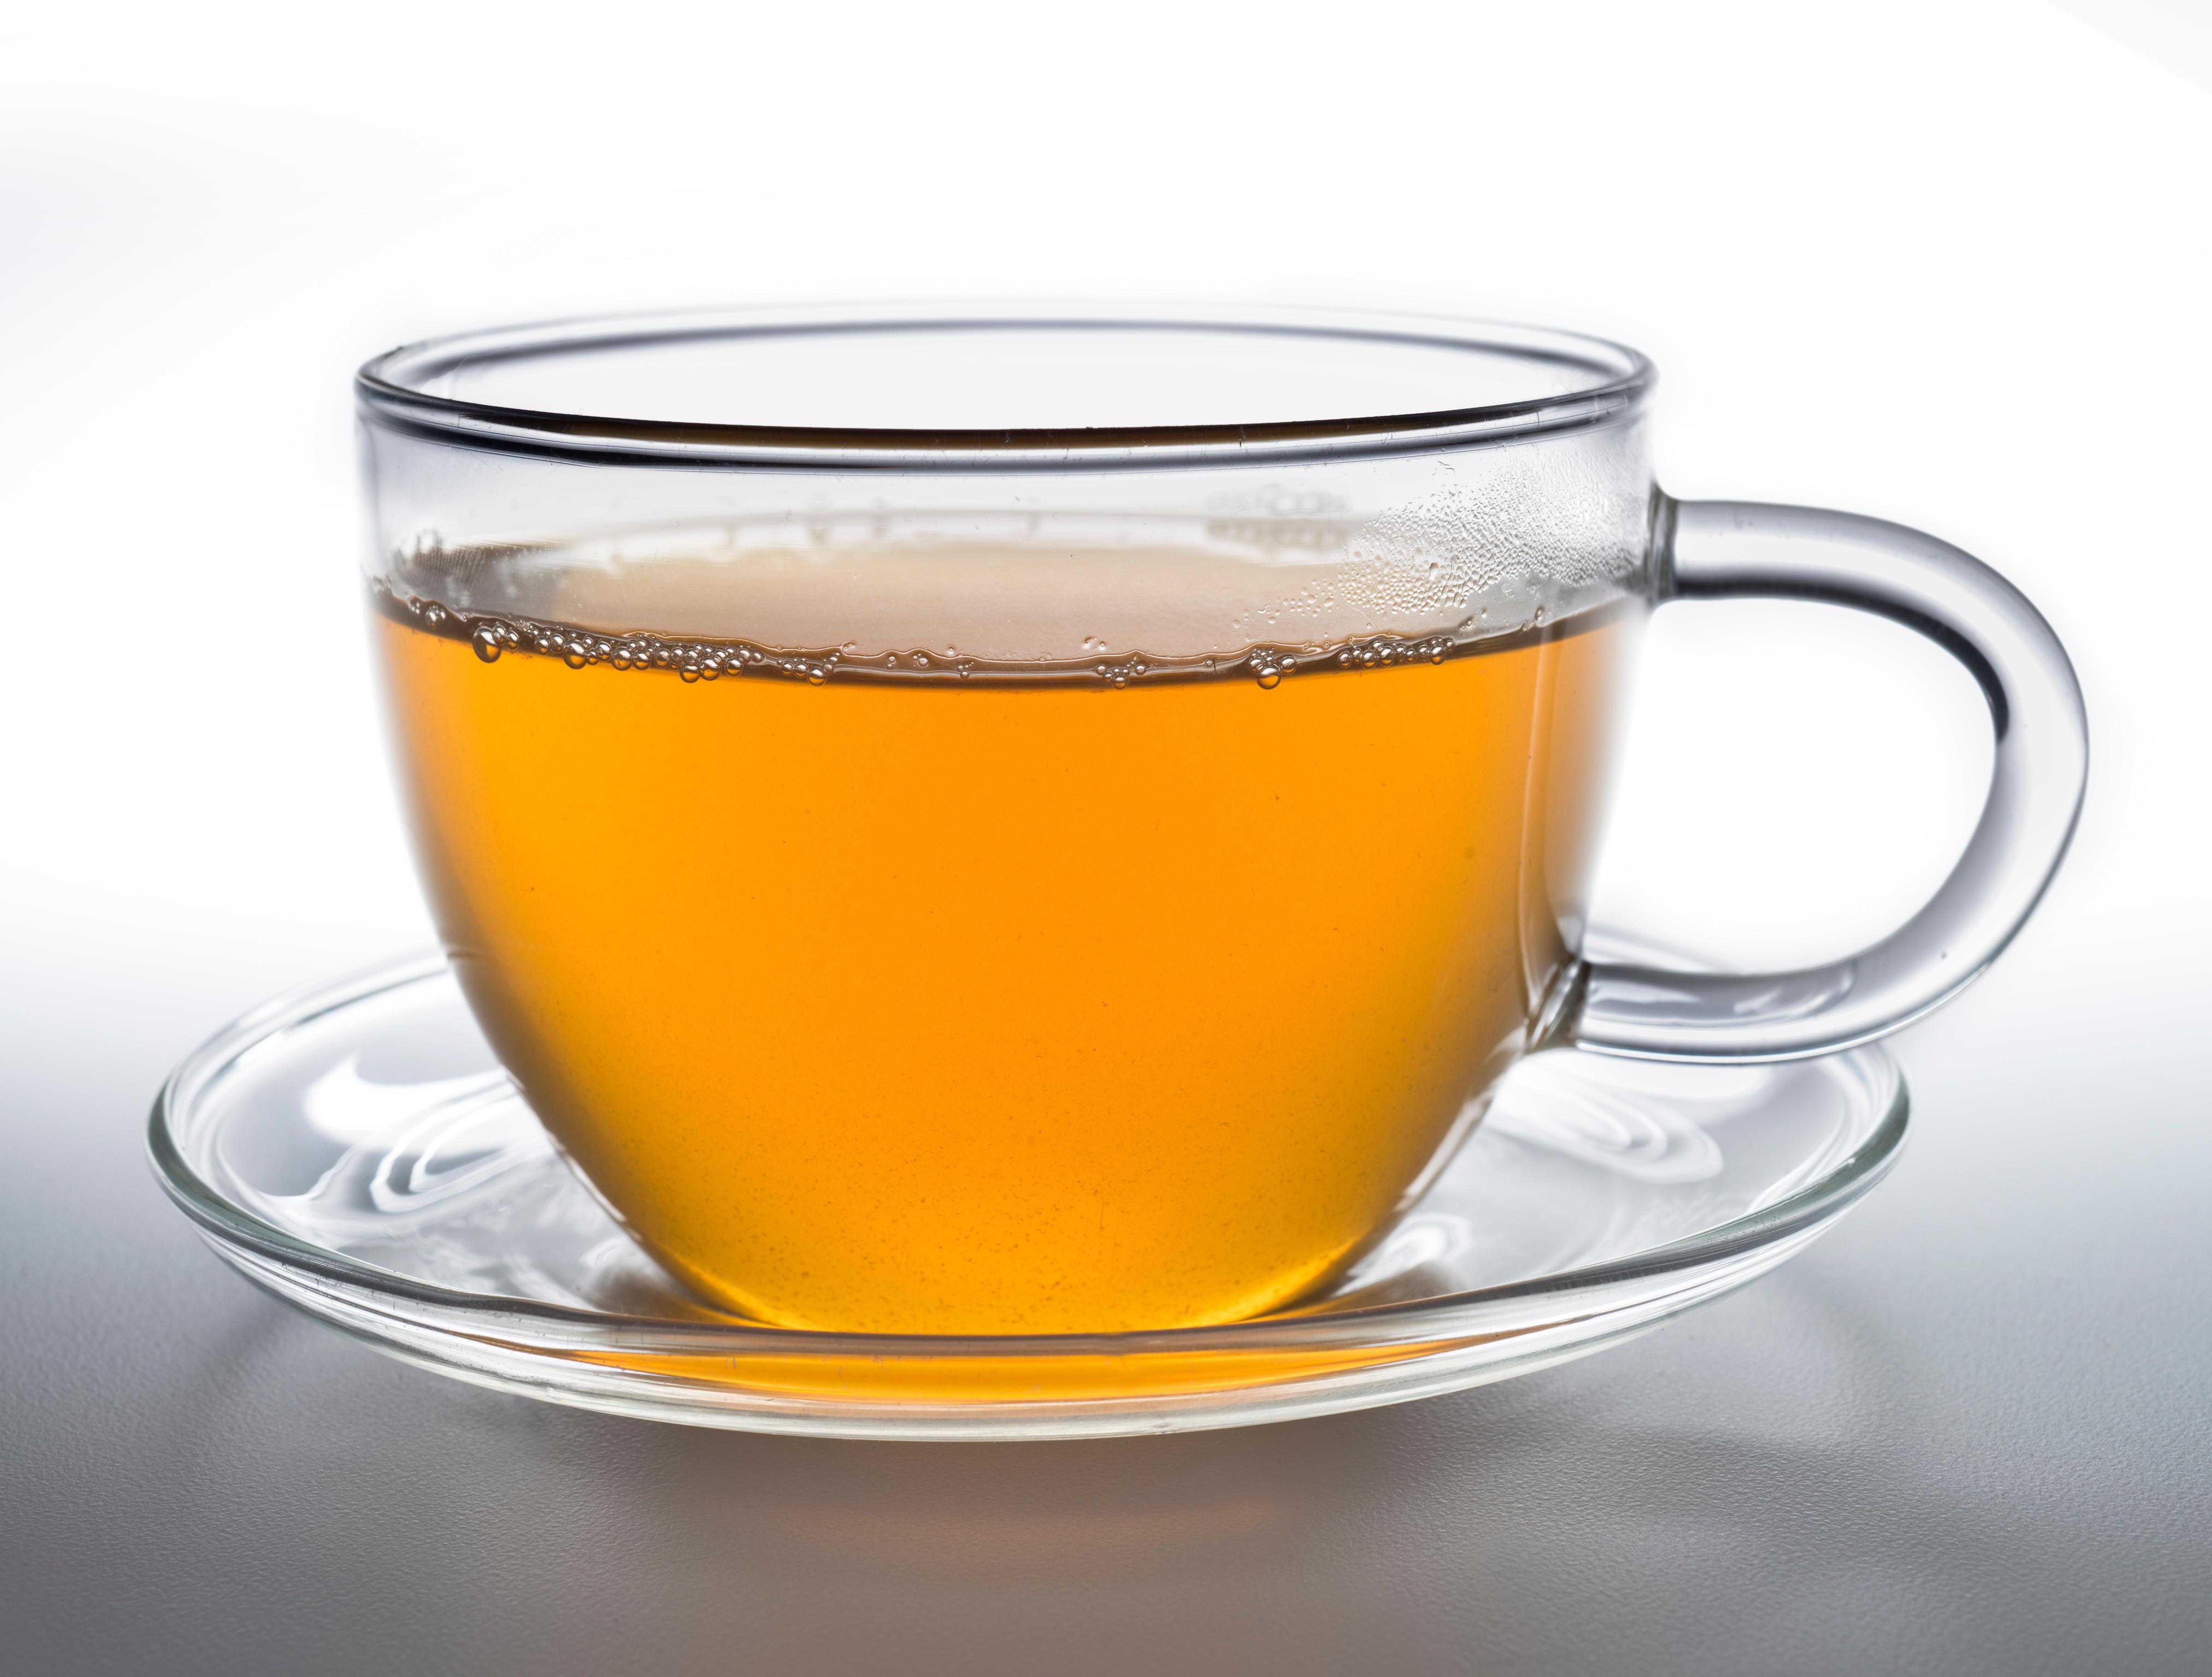 En kop te (Foto: All Over)